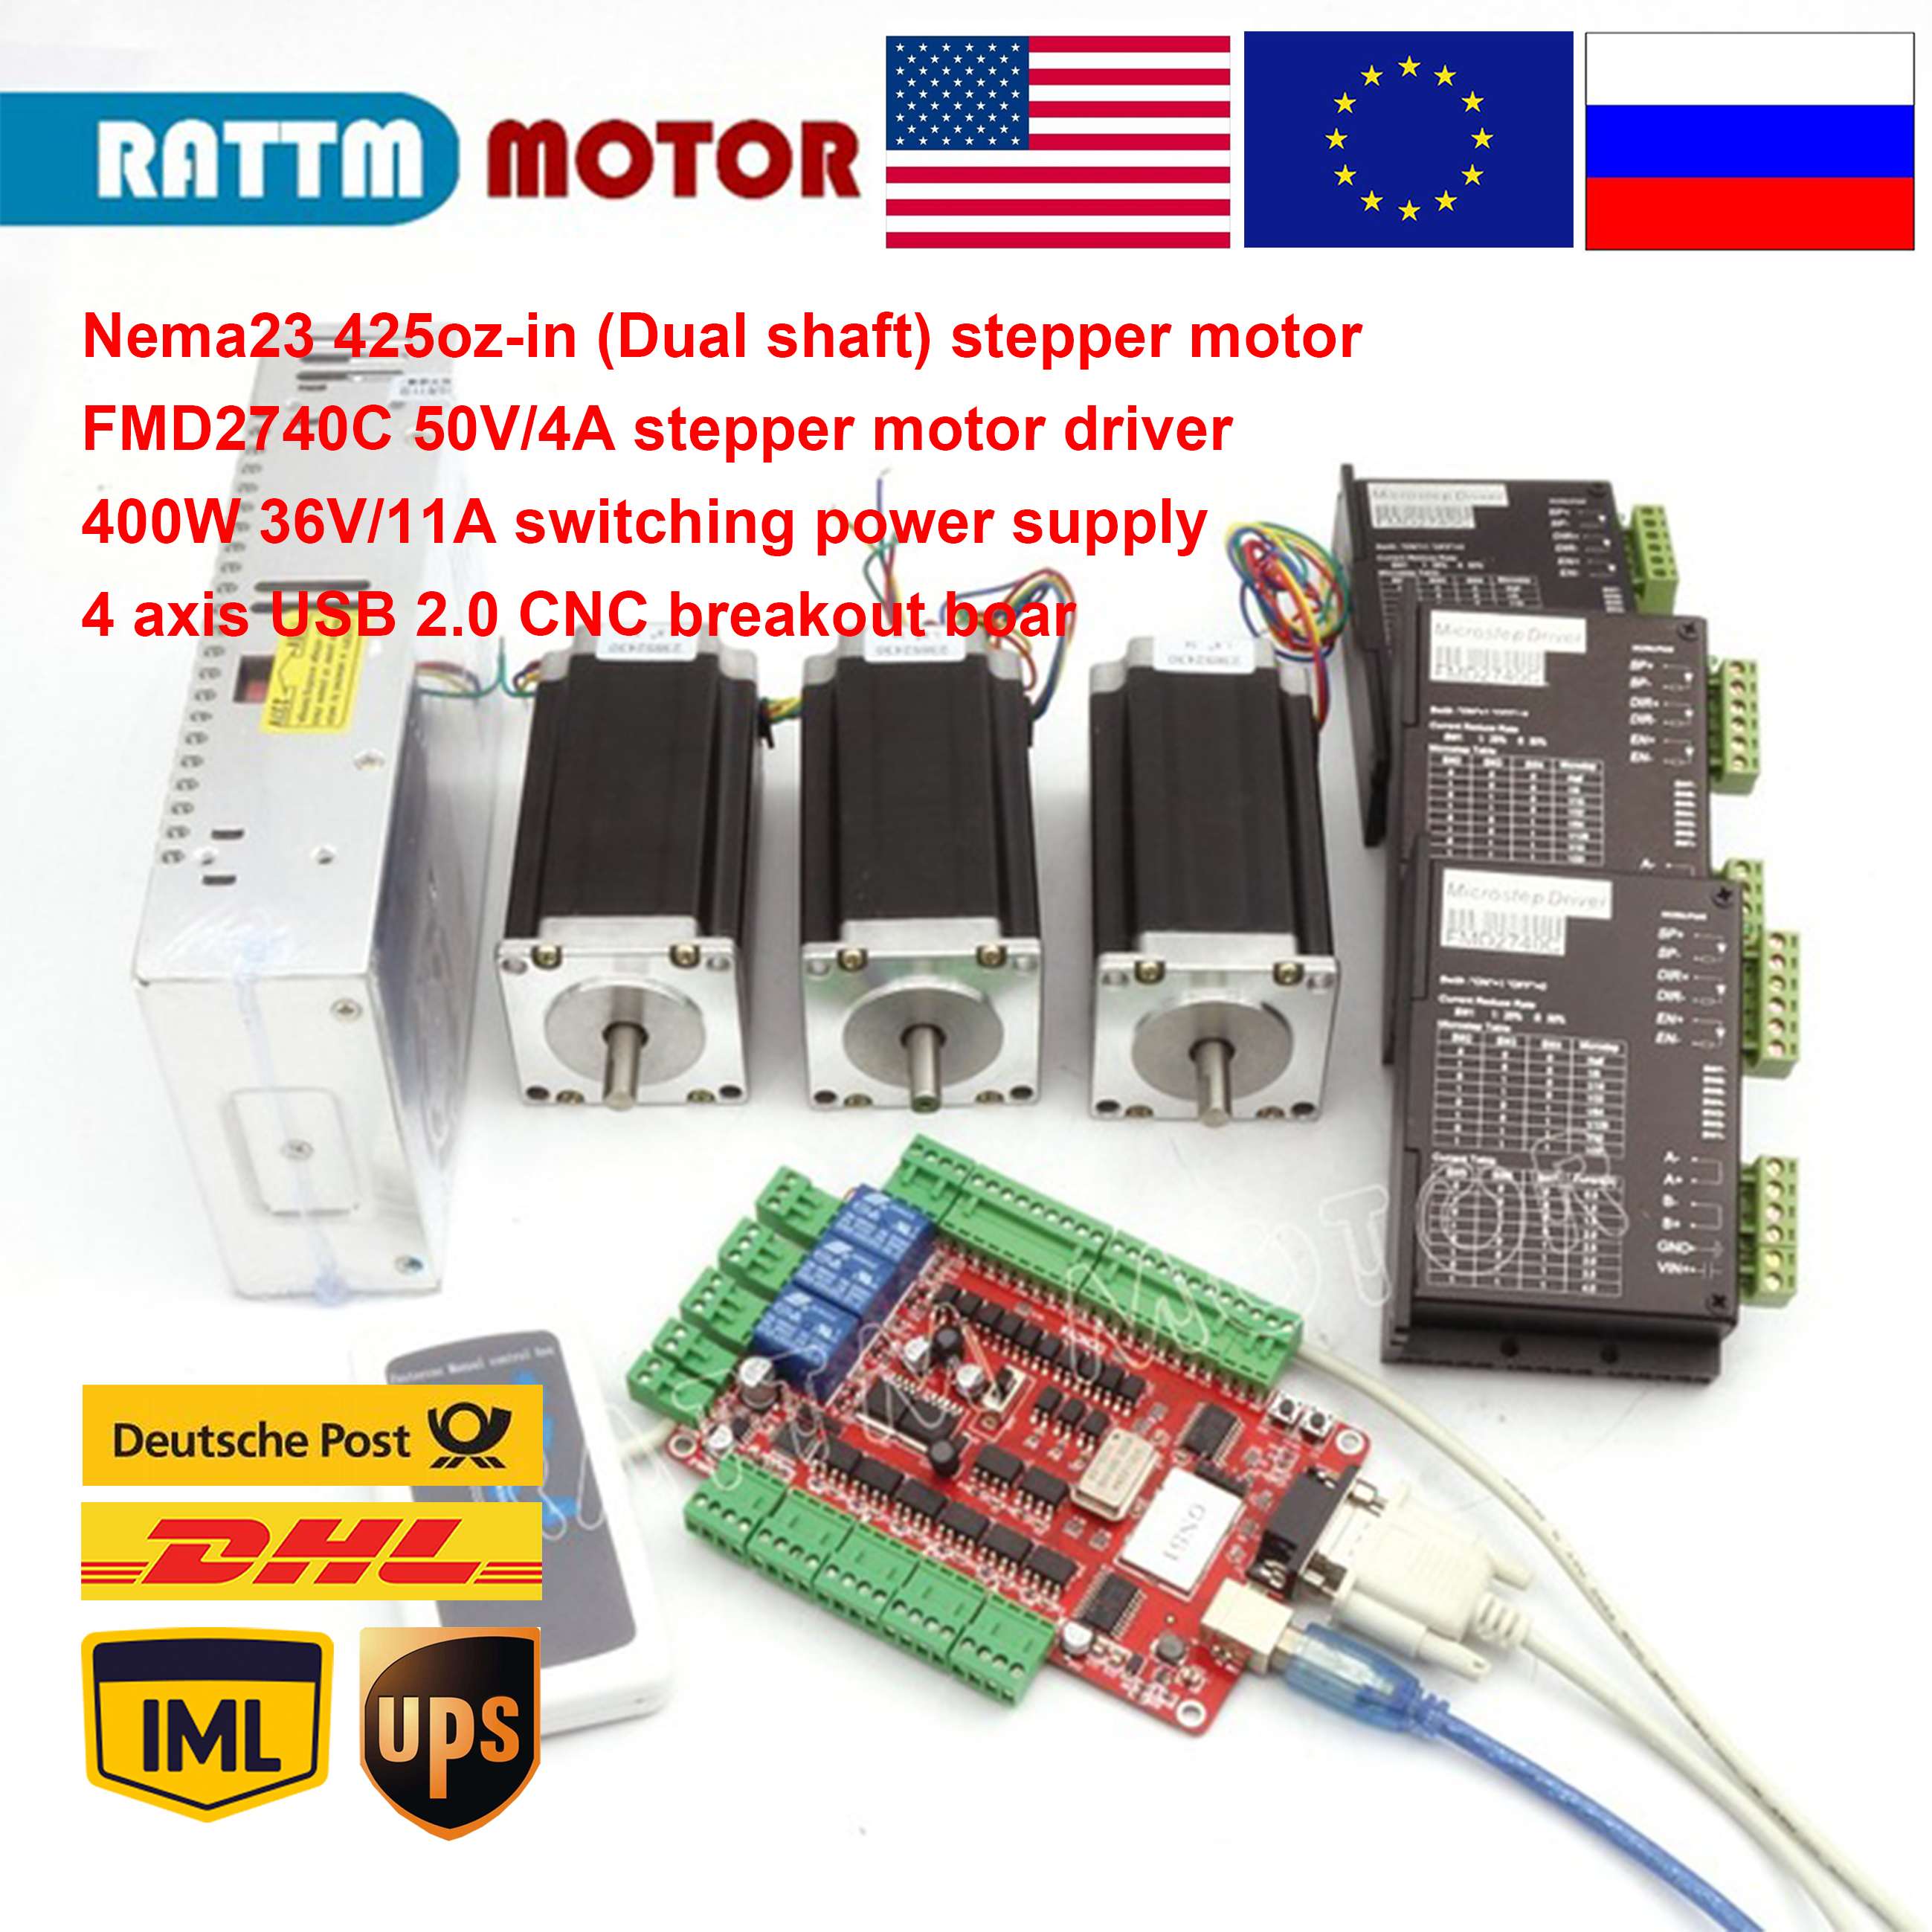 US $183.96 6% OFF|CNC 3 Axis Kit Nema23 stepper motor 112mm(Dual shaft) on